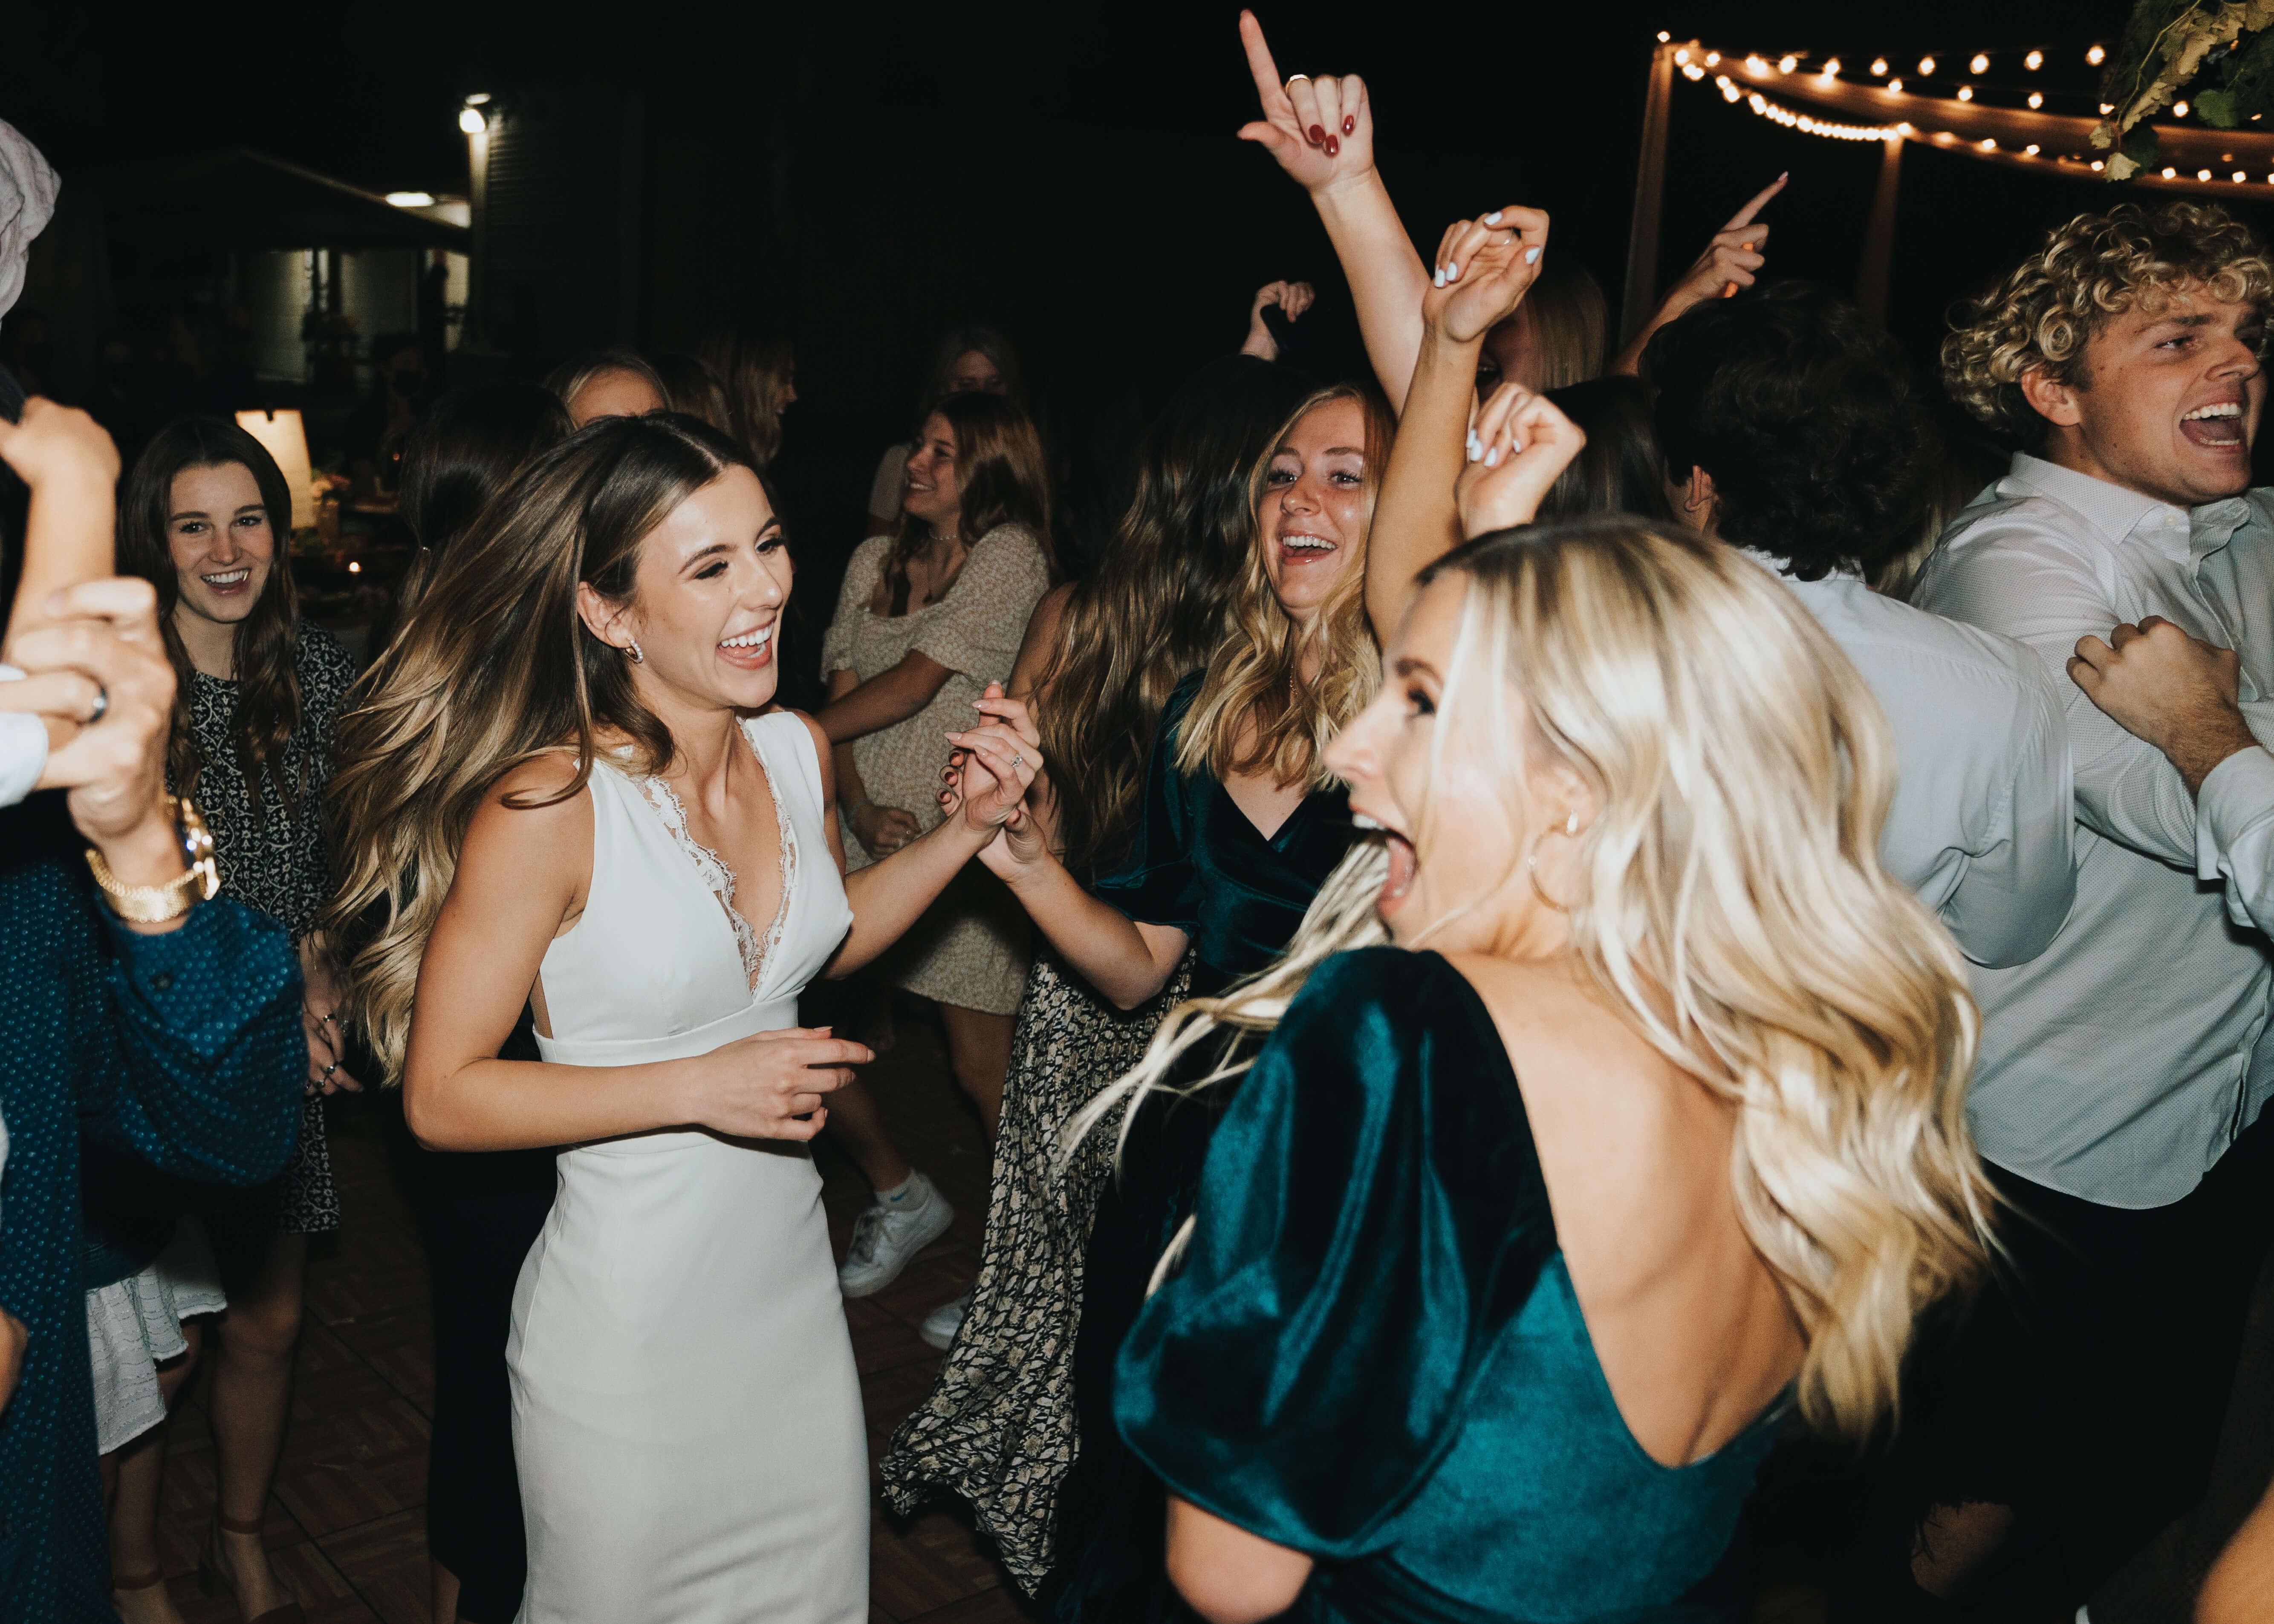 happy dancing photo of bride flash photograpy